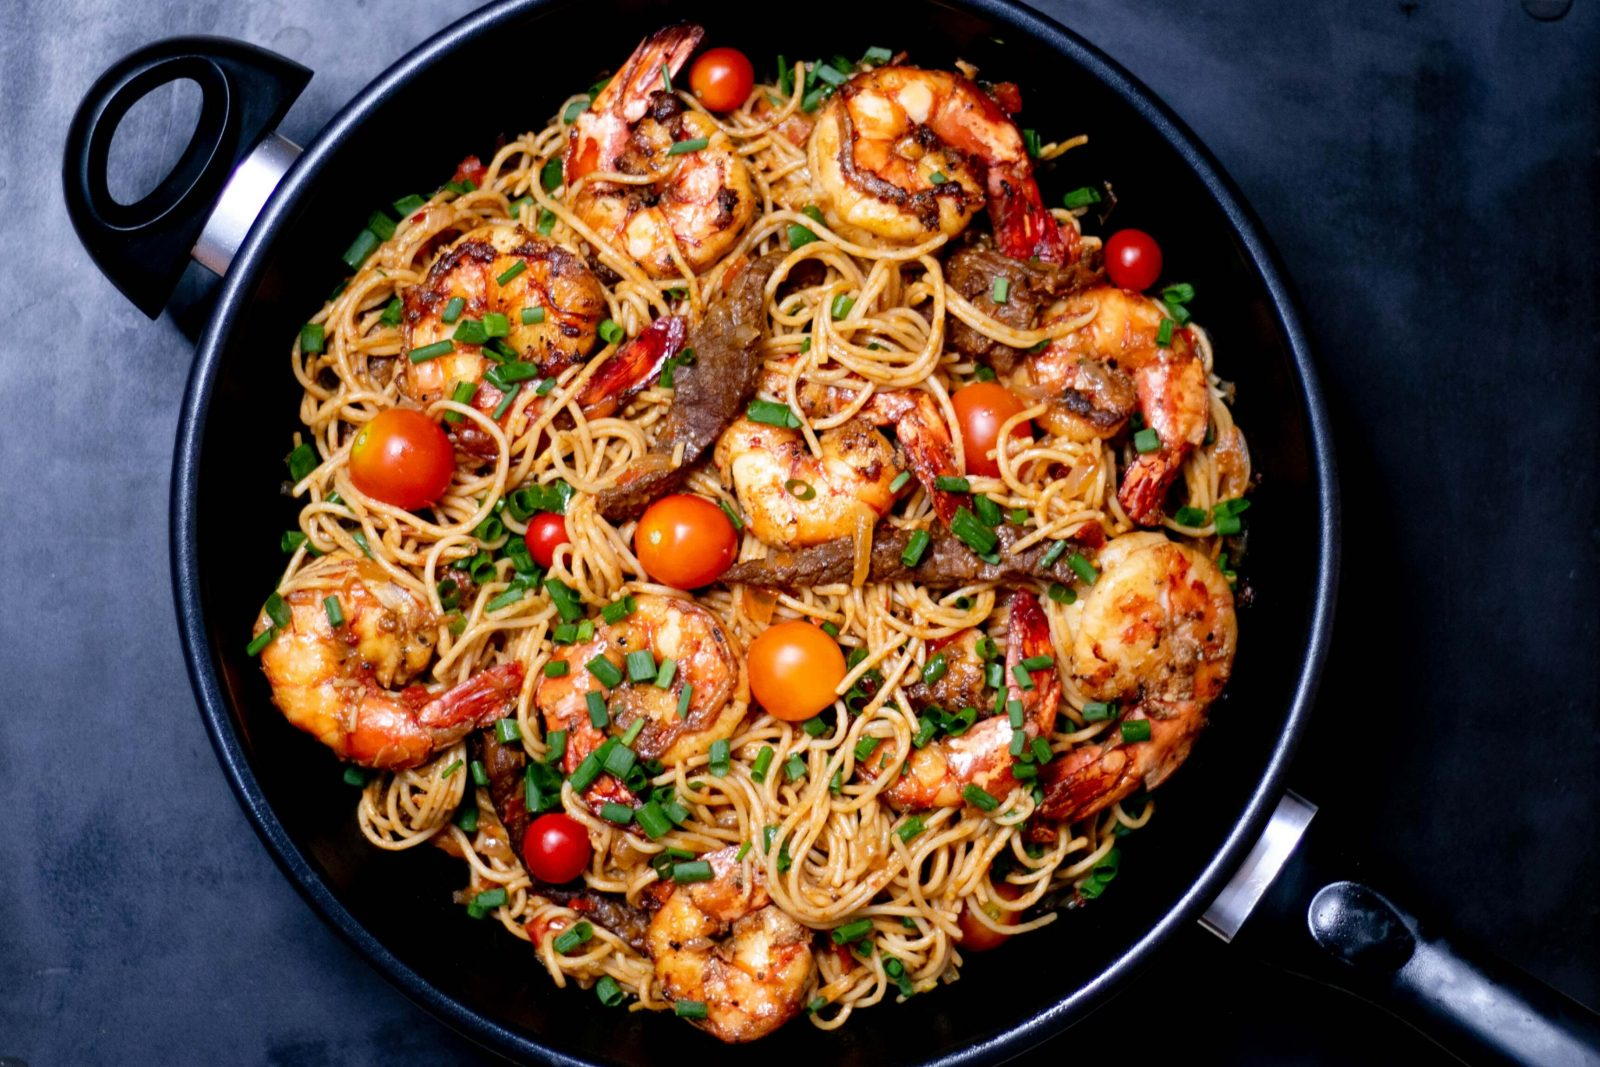 Pan-Asian Shrimp & Vegetables